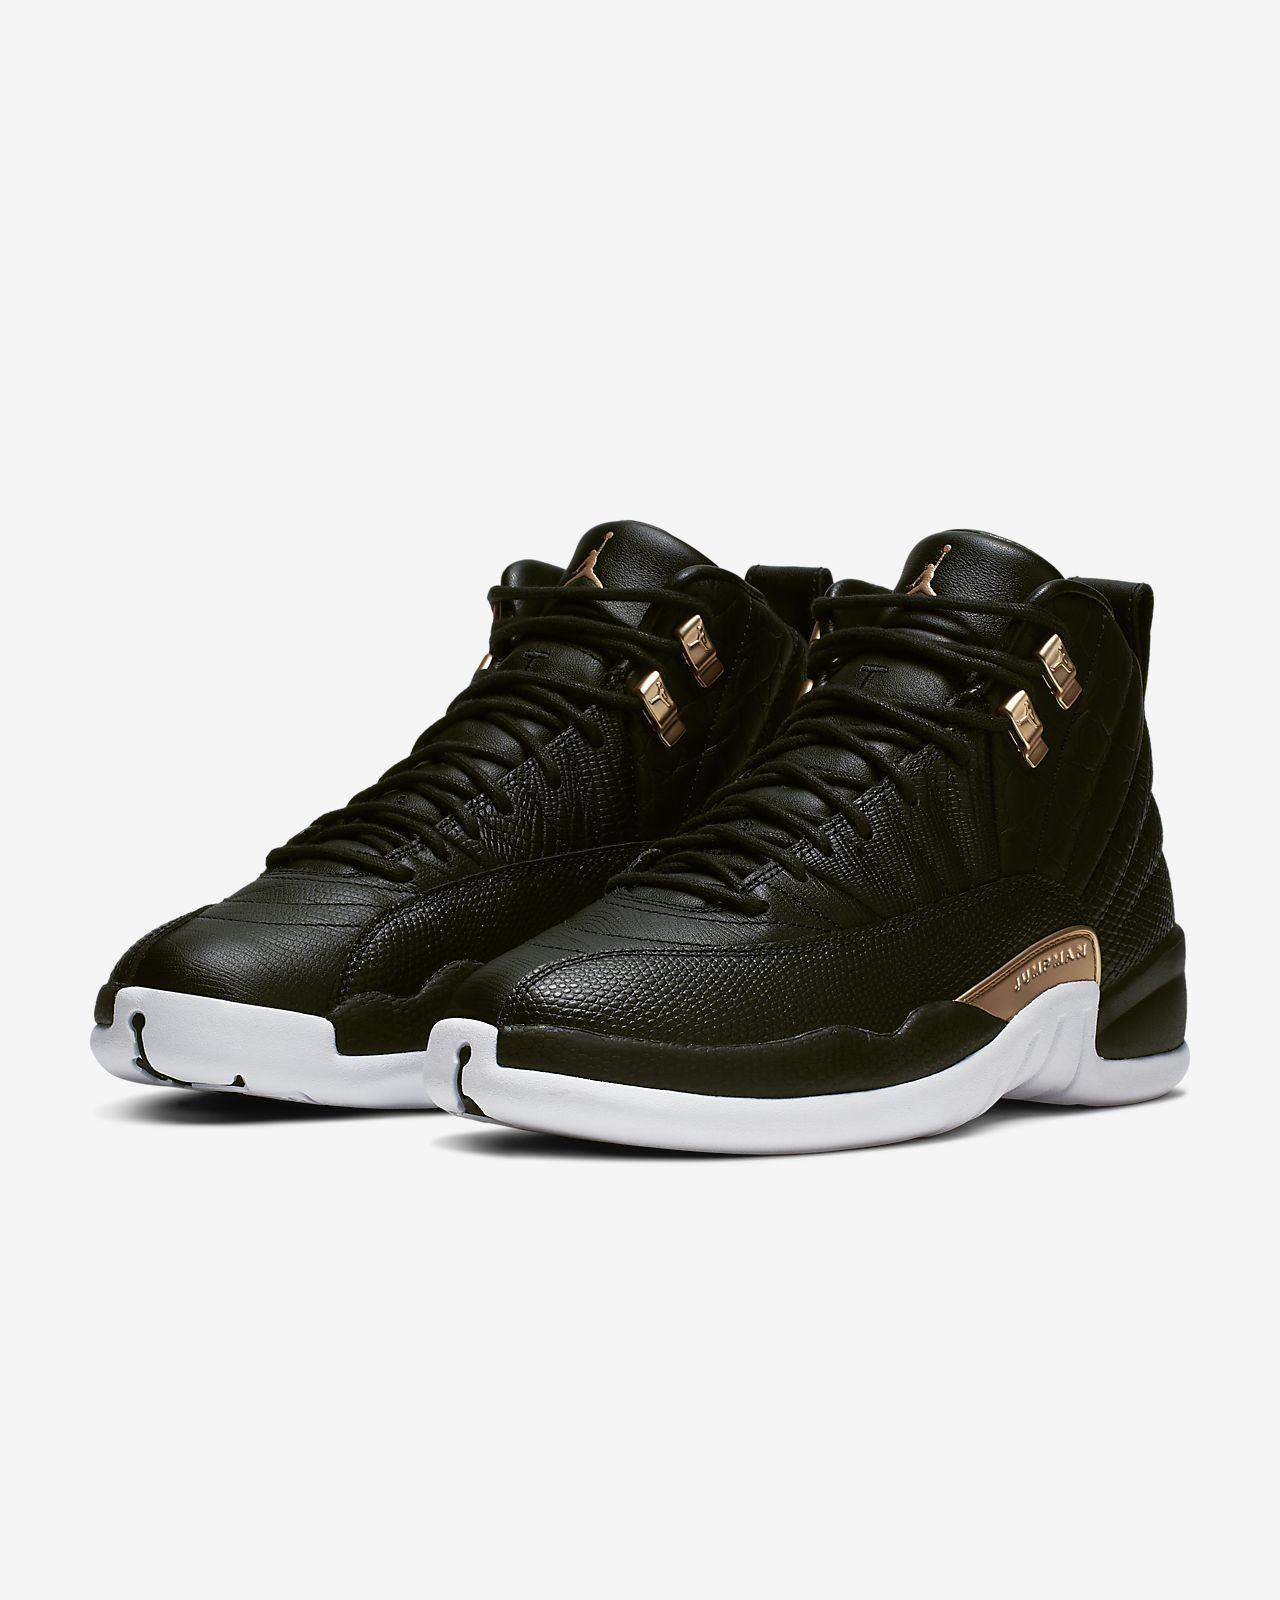 new products 9bbc5 c051a Air Jordan 12 Retro Women's Shoe